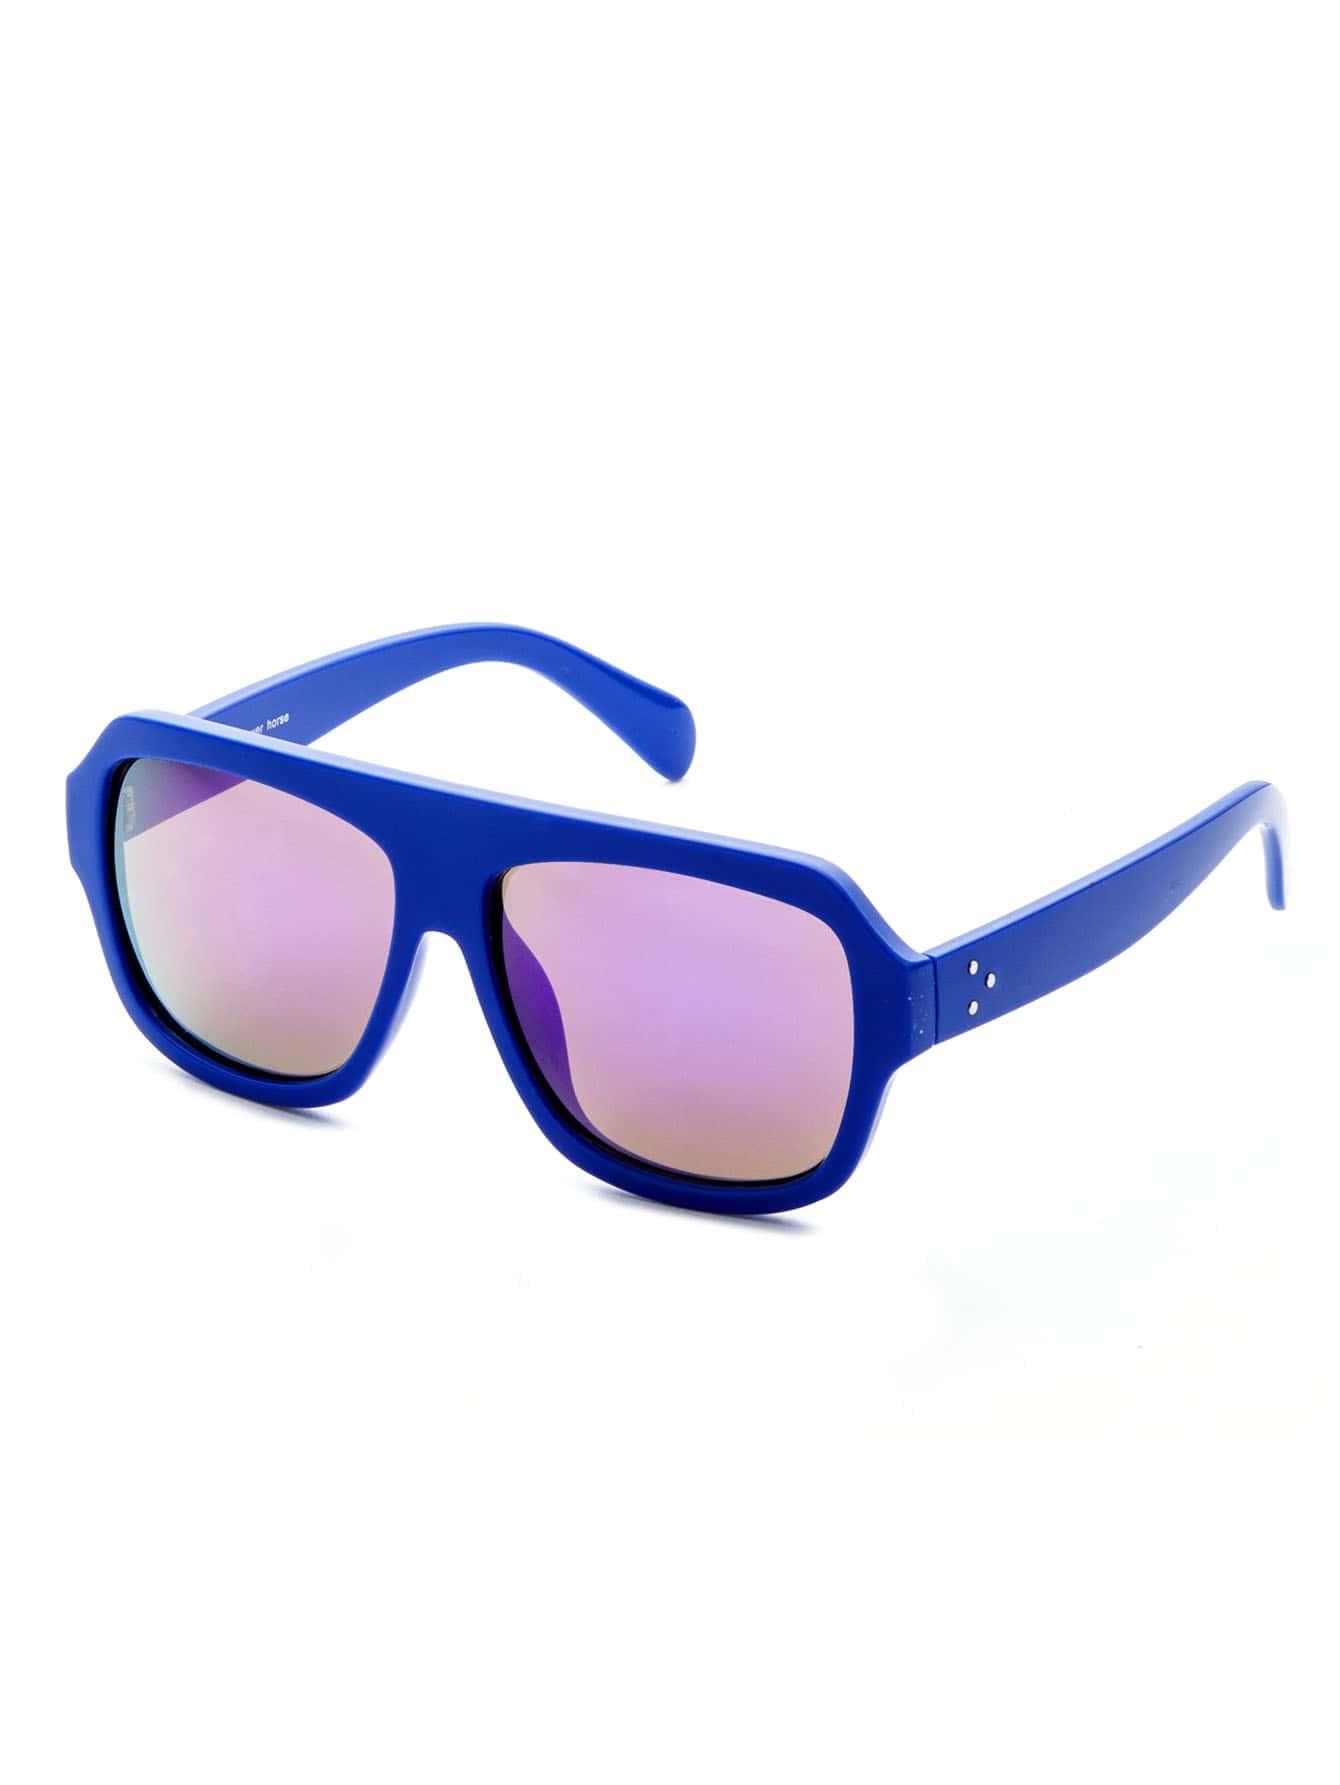 Blue Frame Large Lens Sunglasses sunglass161013308